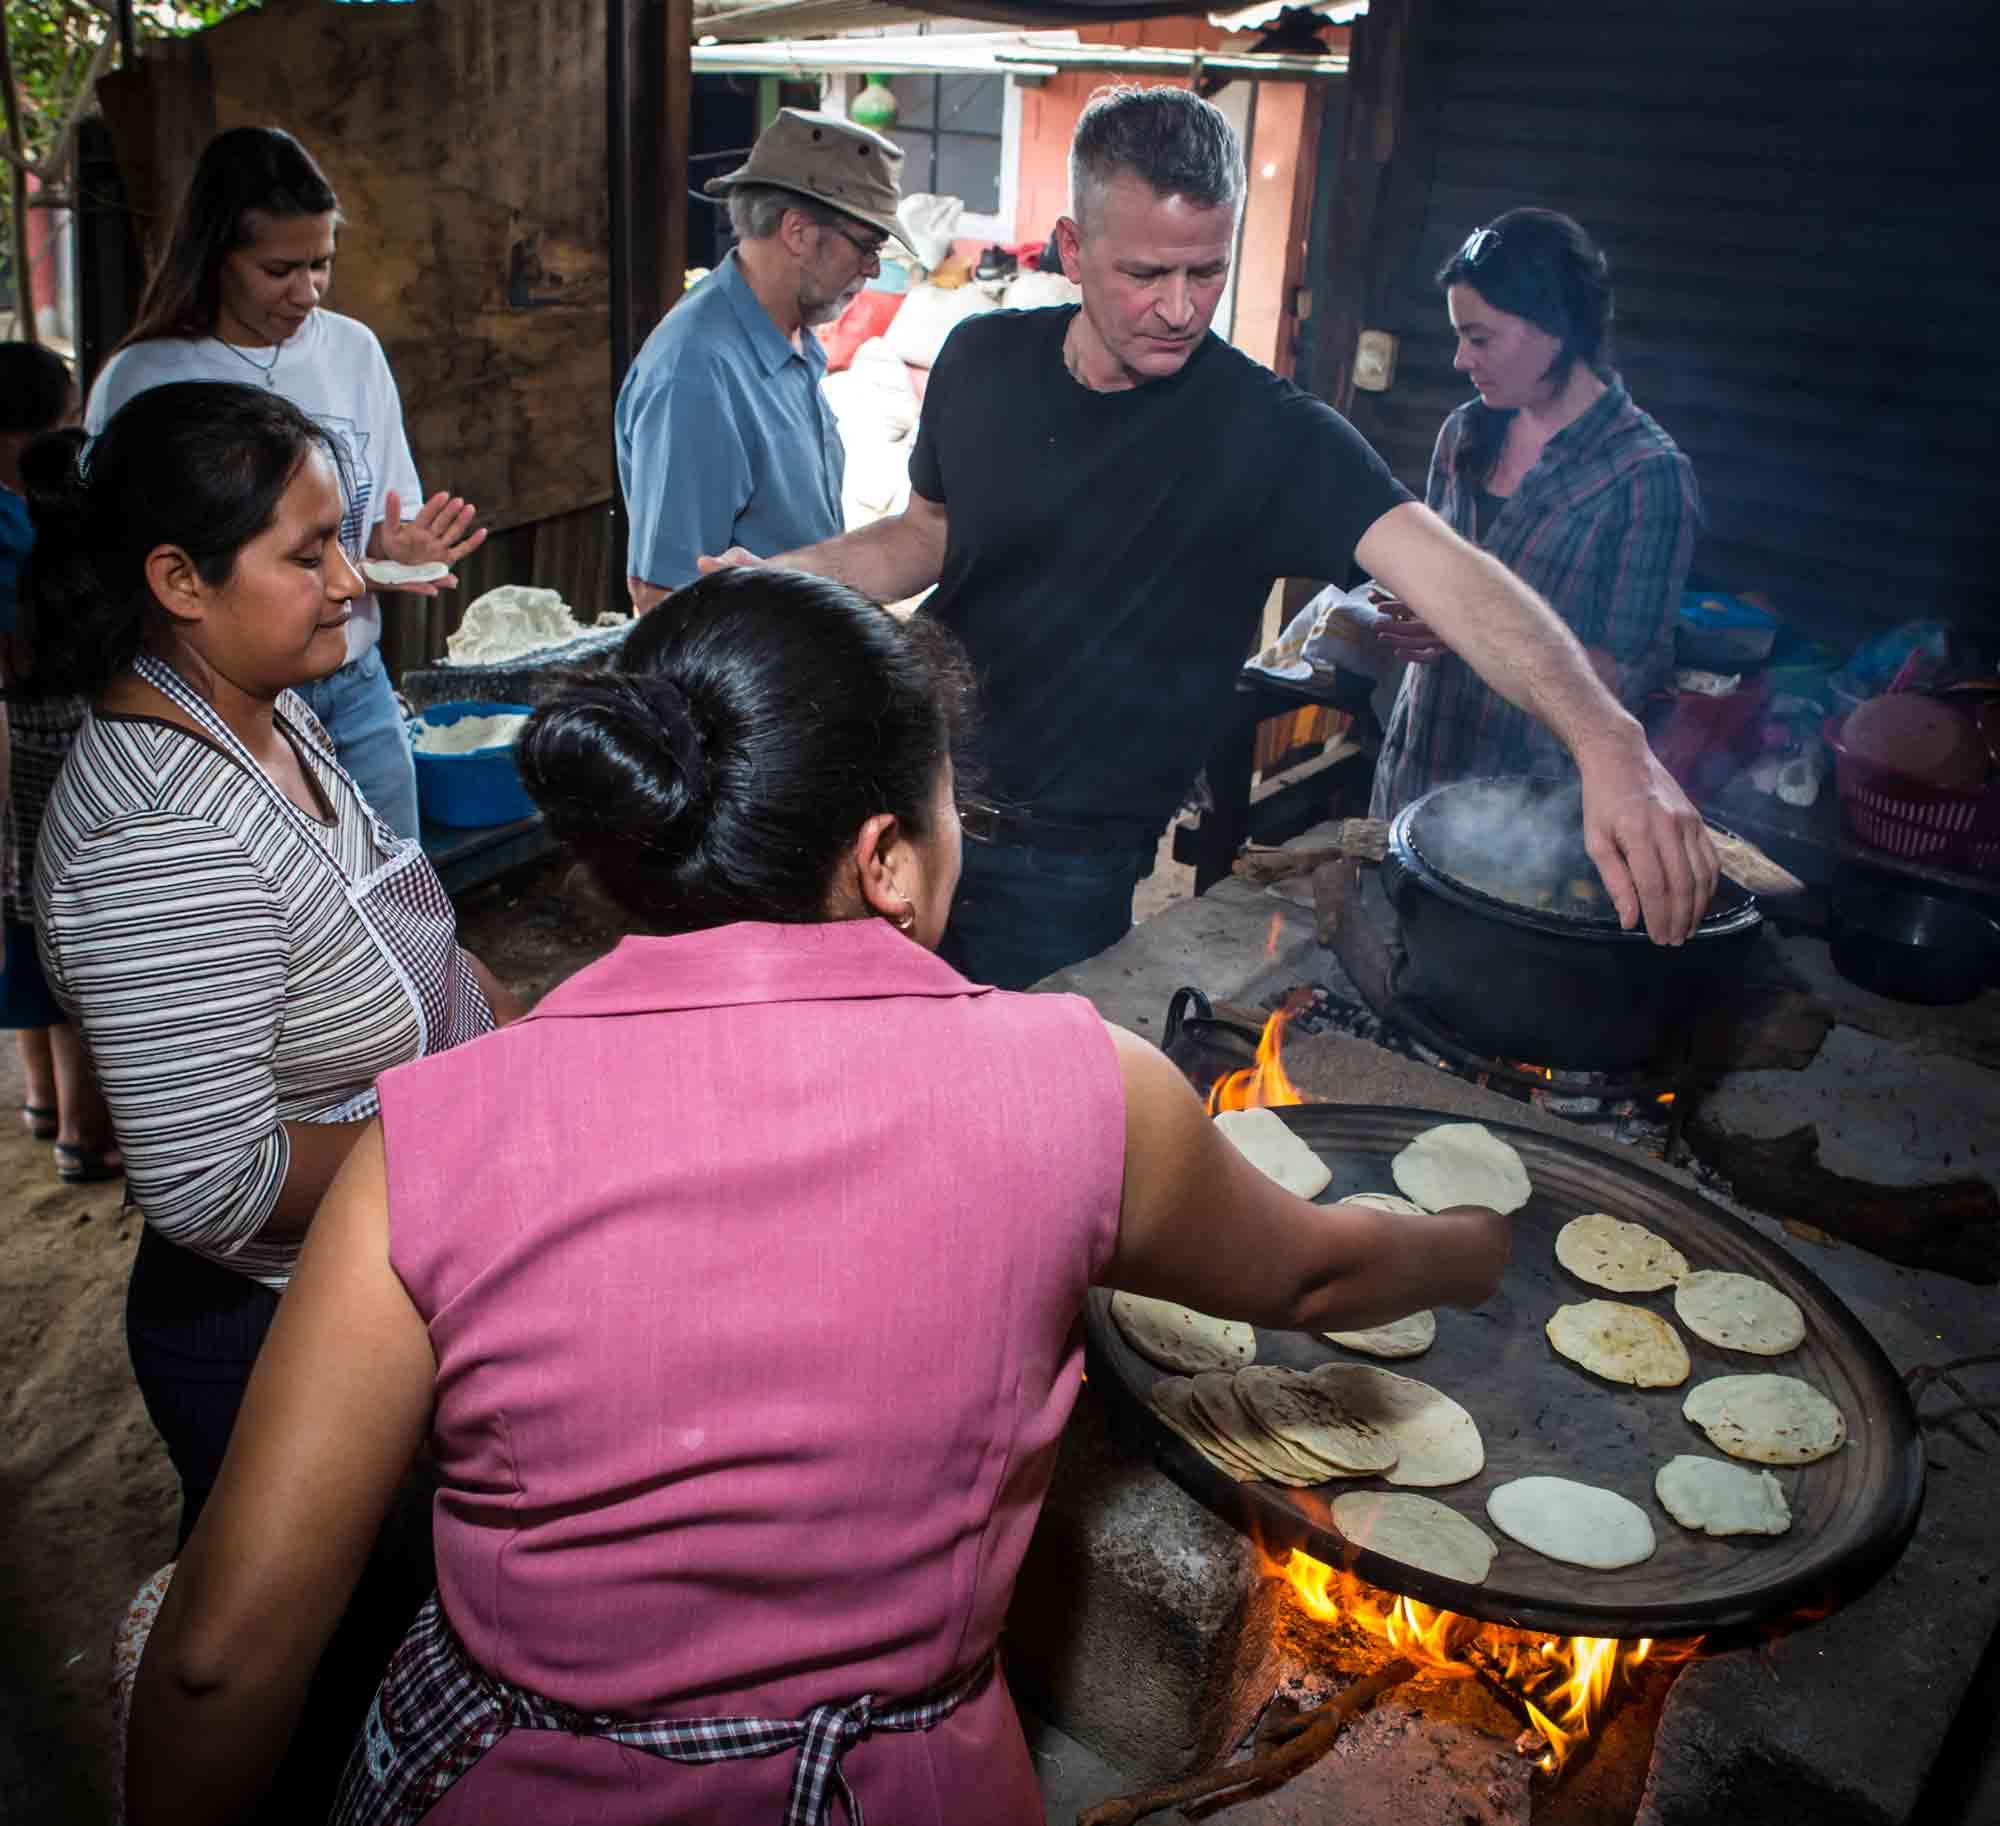 Cooking-tortillas.jpg